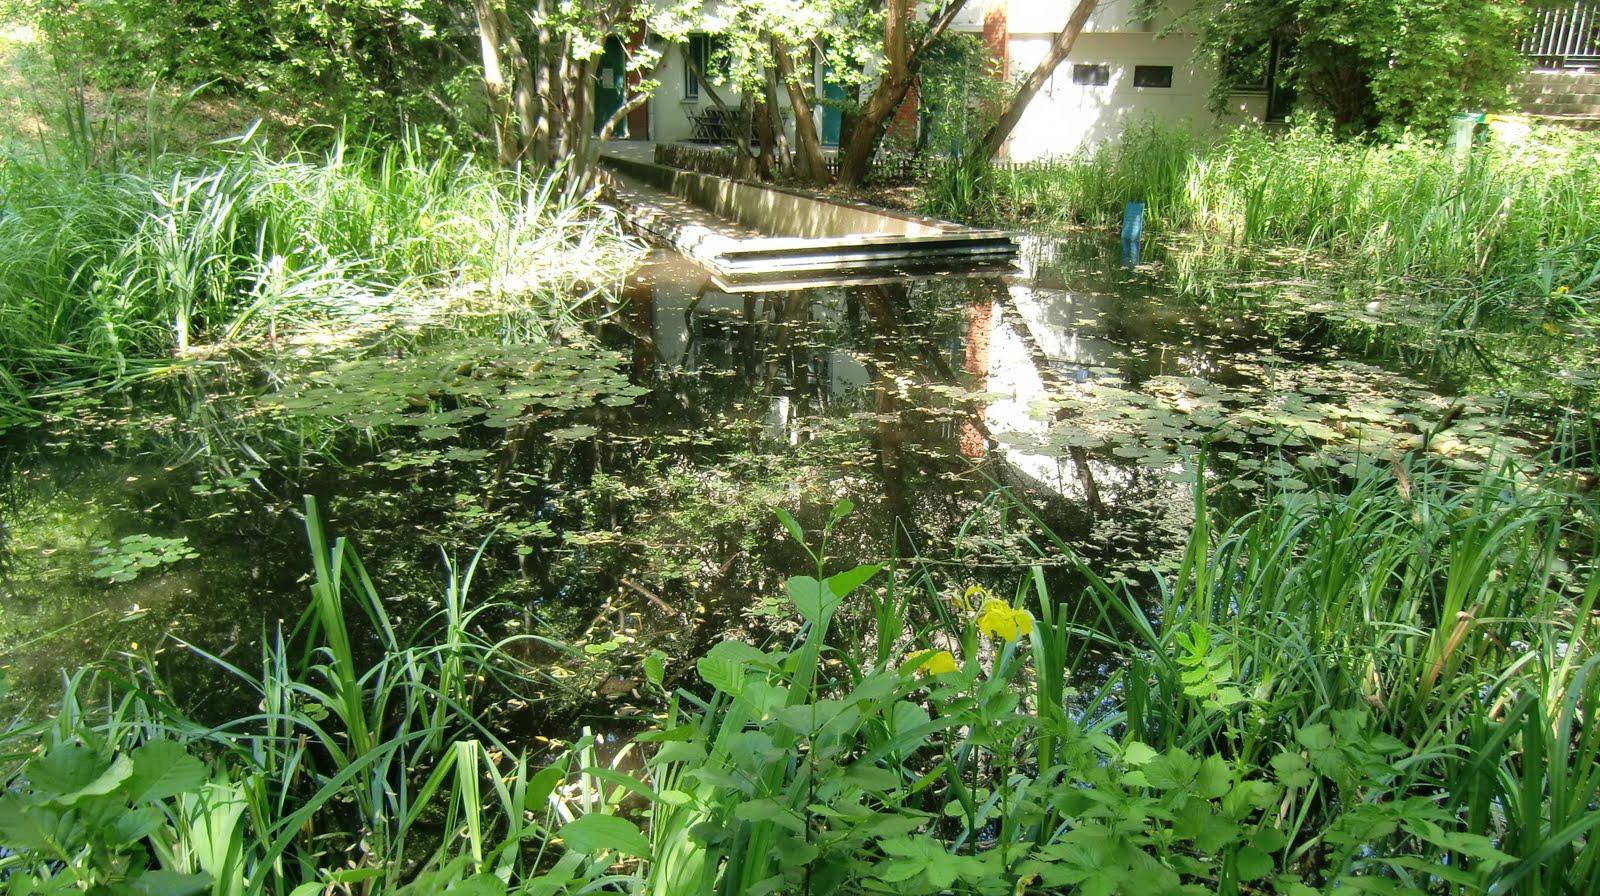 Promenade D Une Fleur Urbaine Pause Au Jardin Naturel